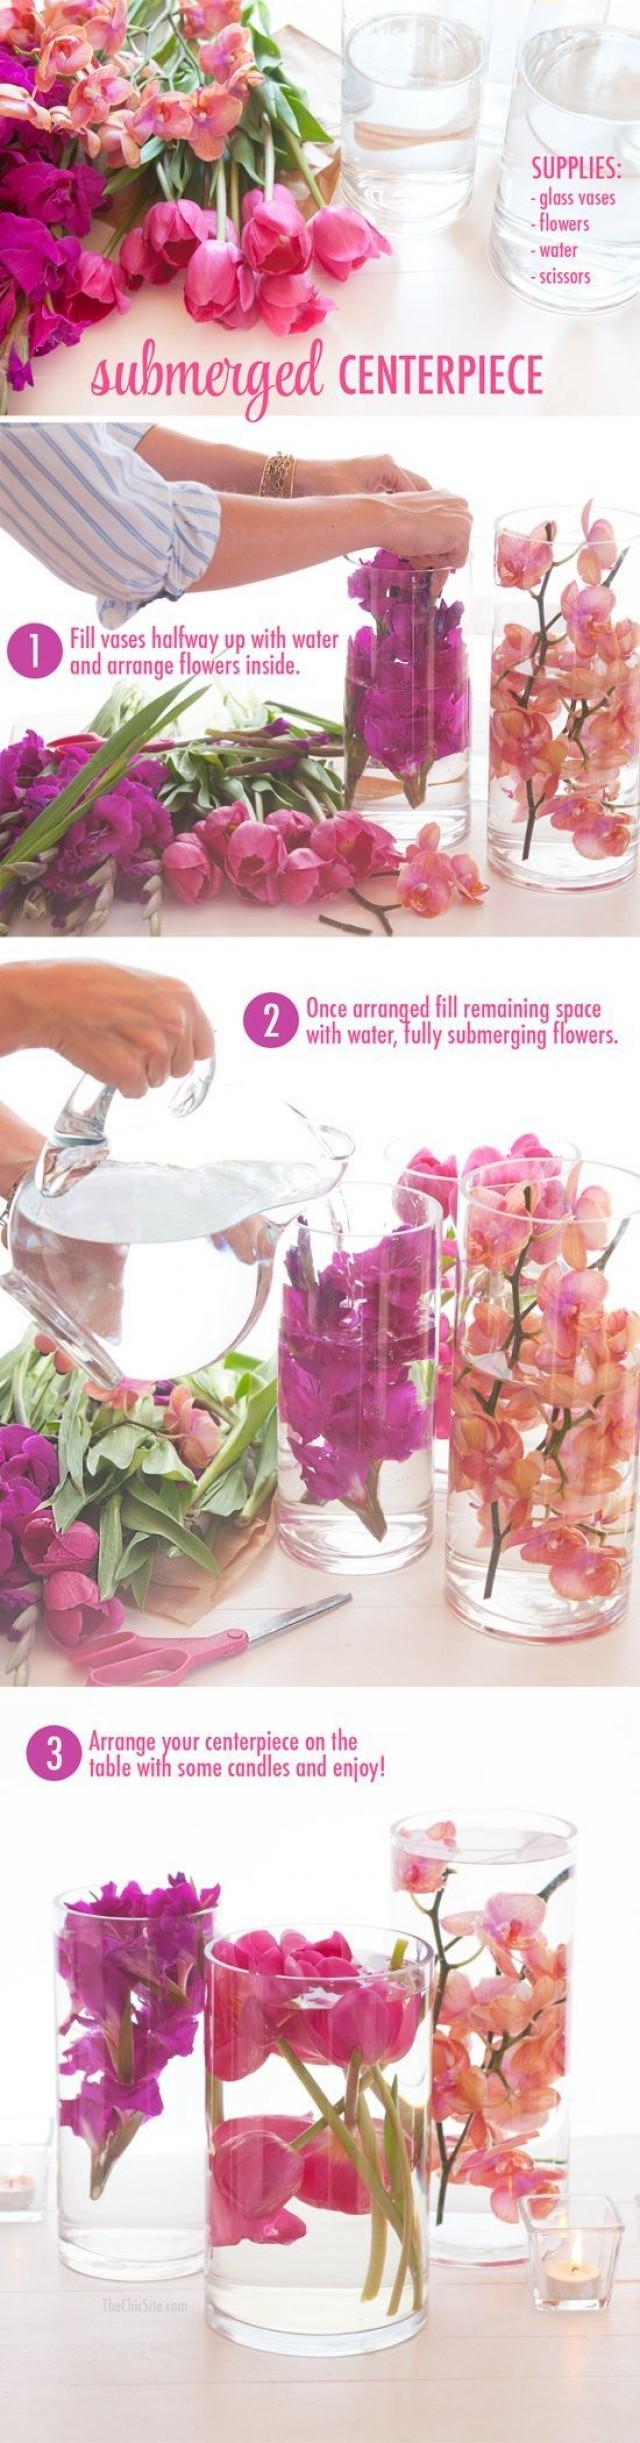 100 DIY Wedding Centerpieces On A Budget 2544531